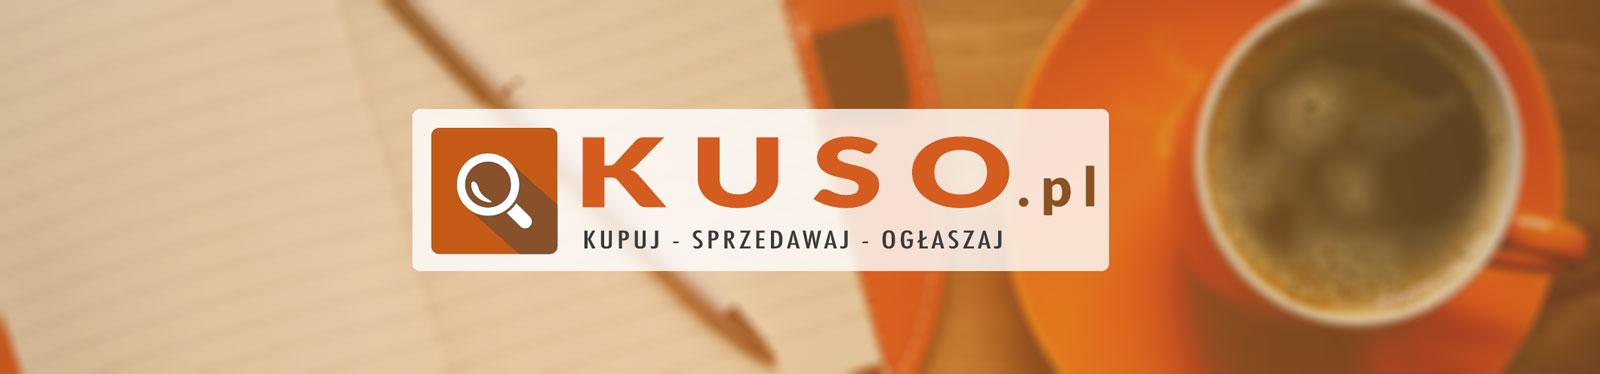 KUSO.pl